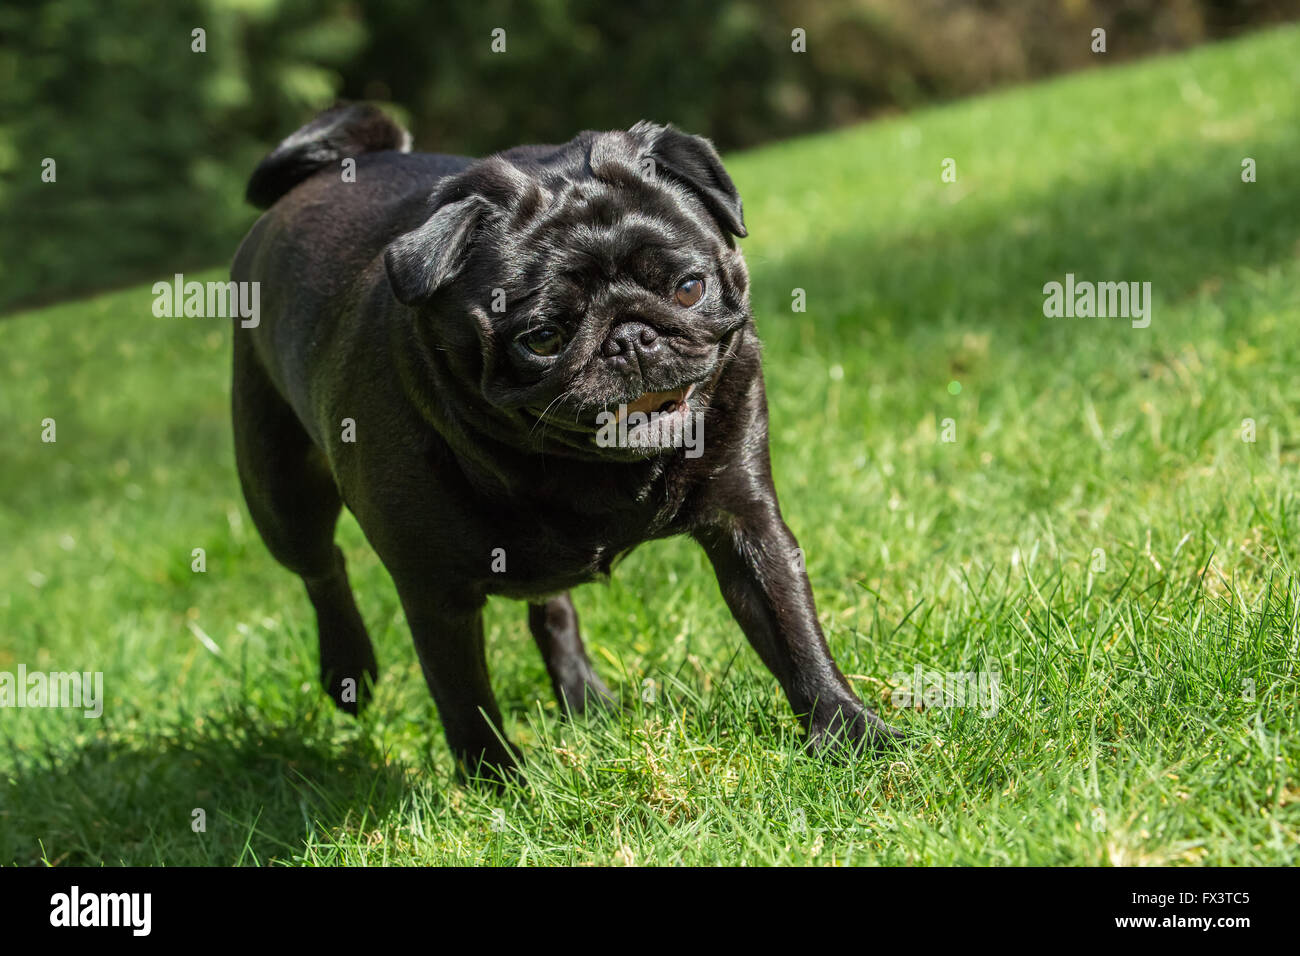 Kirby, a black Pug, walking in his yard in Redmond, Washington, USA - Stock Image